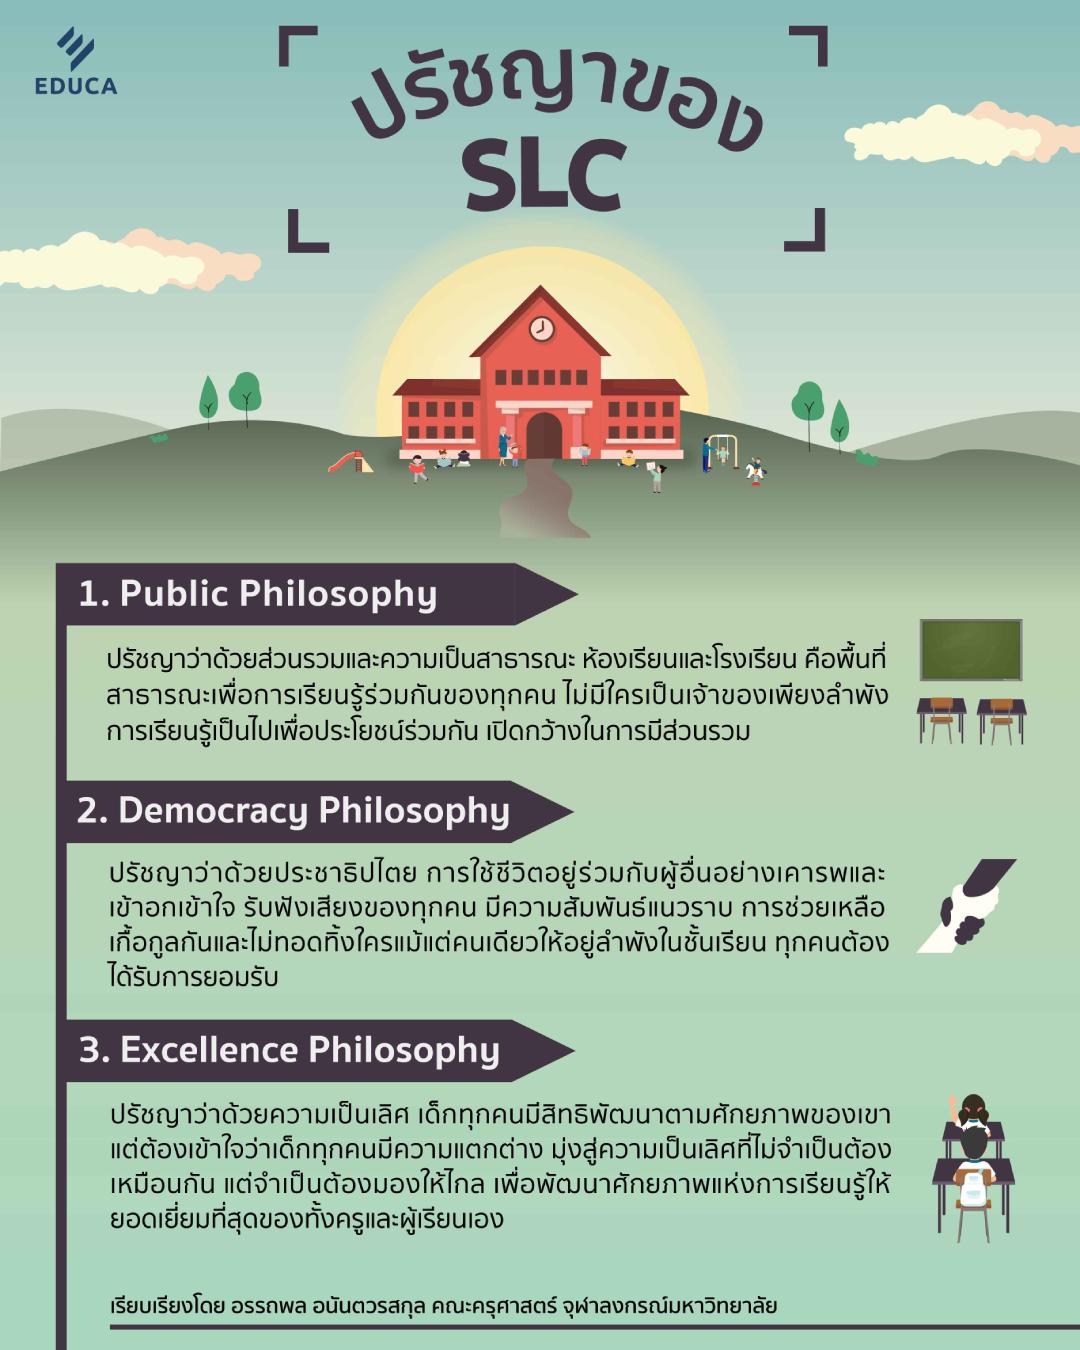 SLC - School as Learning Community